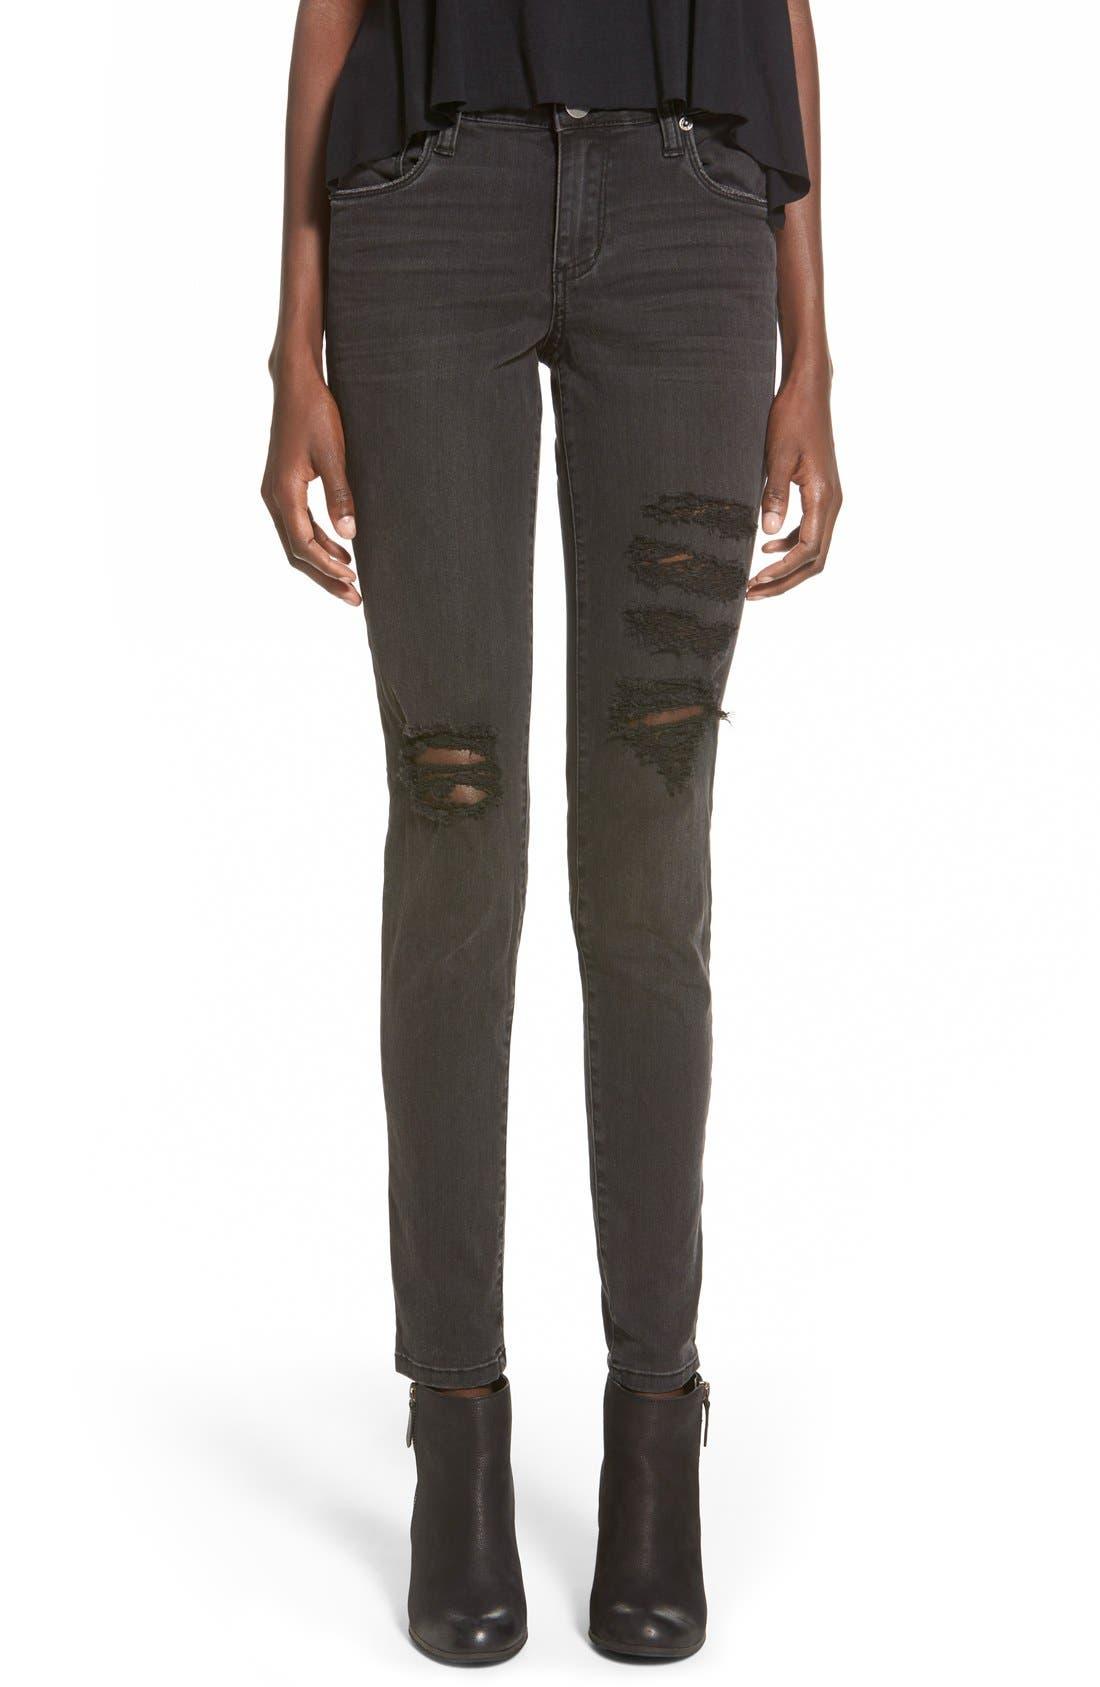 Alternate Image 1 Selected - STSBlue 'Piper' Destroyed Skinny Jeans (Black)